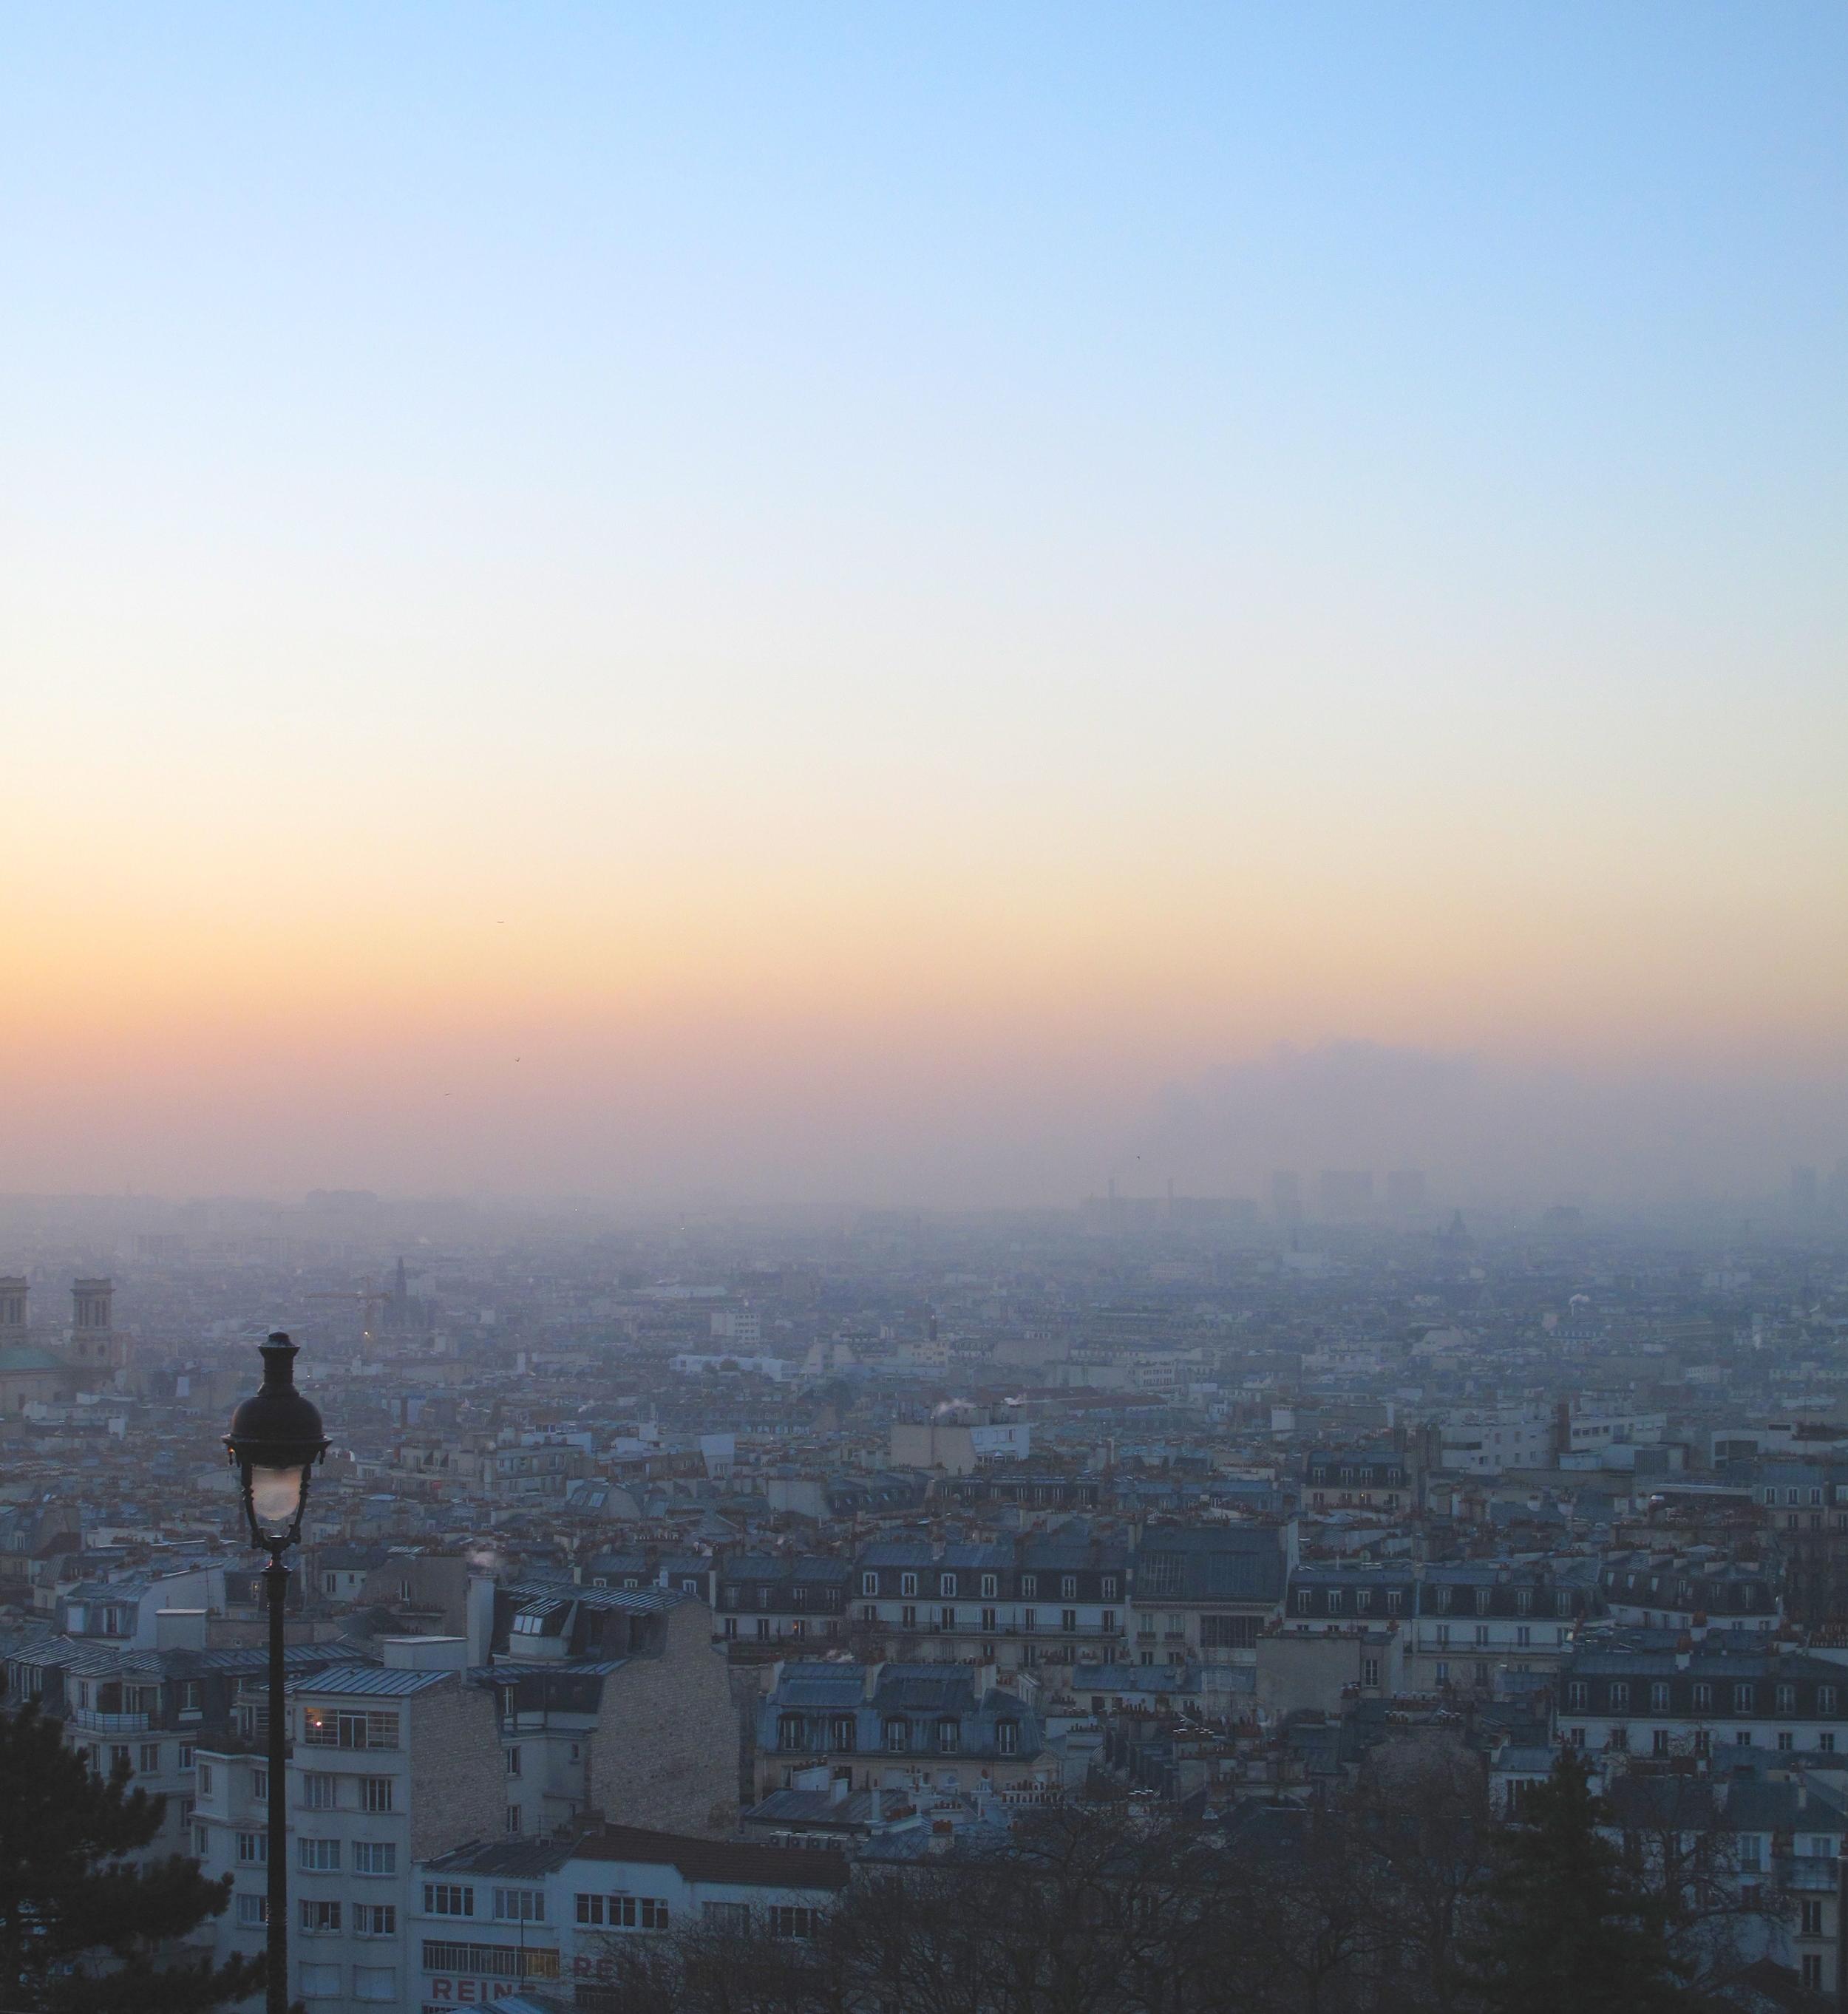 The view of Paris city from Sacré Coeur at sunrise